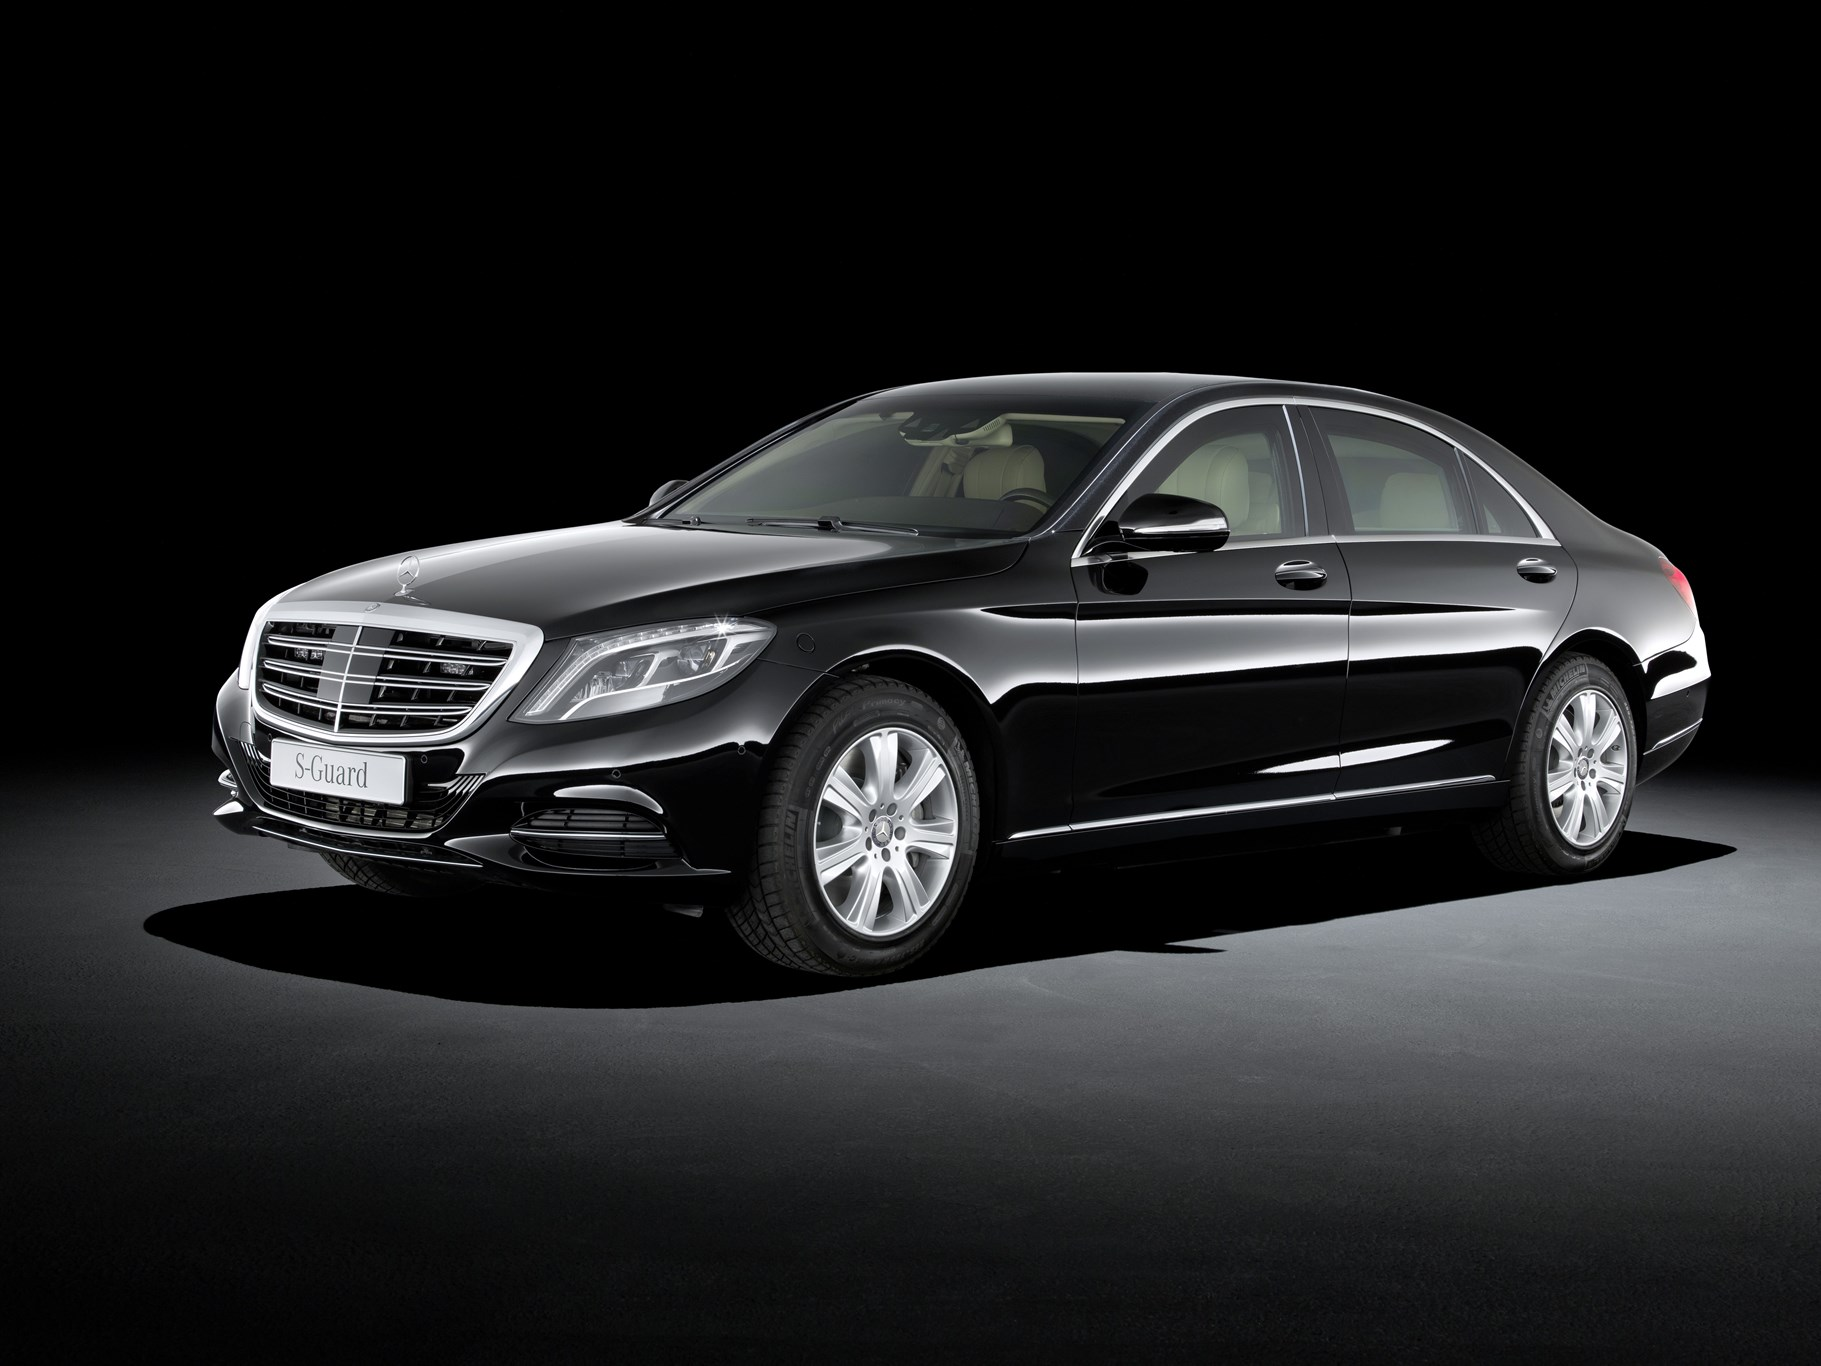 Mercedes-Benz S-class review: we drive the S560e hybrid | CAR Magazine